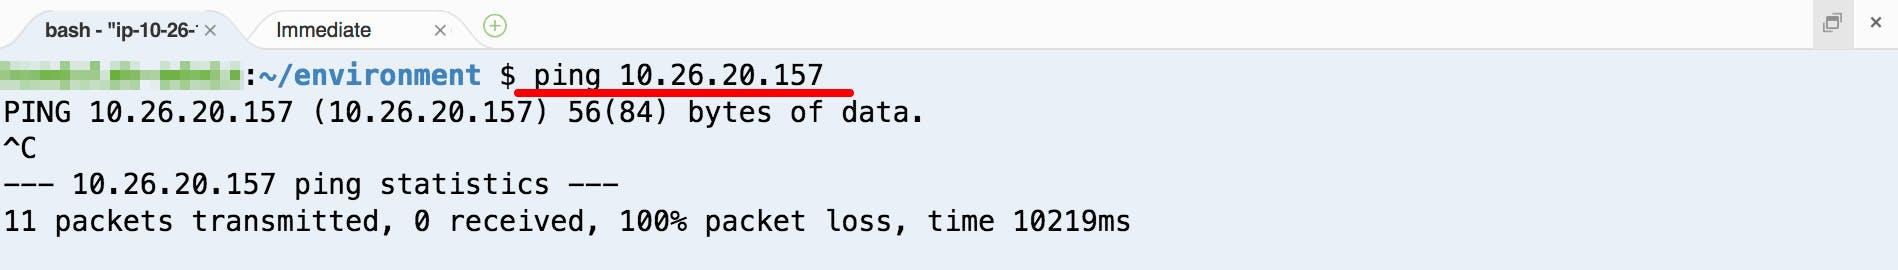 cloud9-for-sample - AWS Cloud9_2018-12-12_09-58-06.png